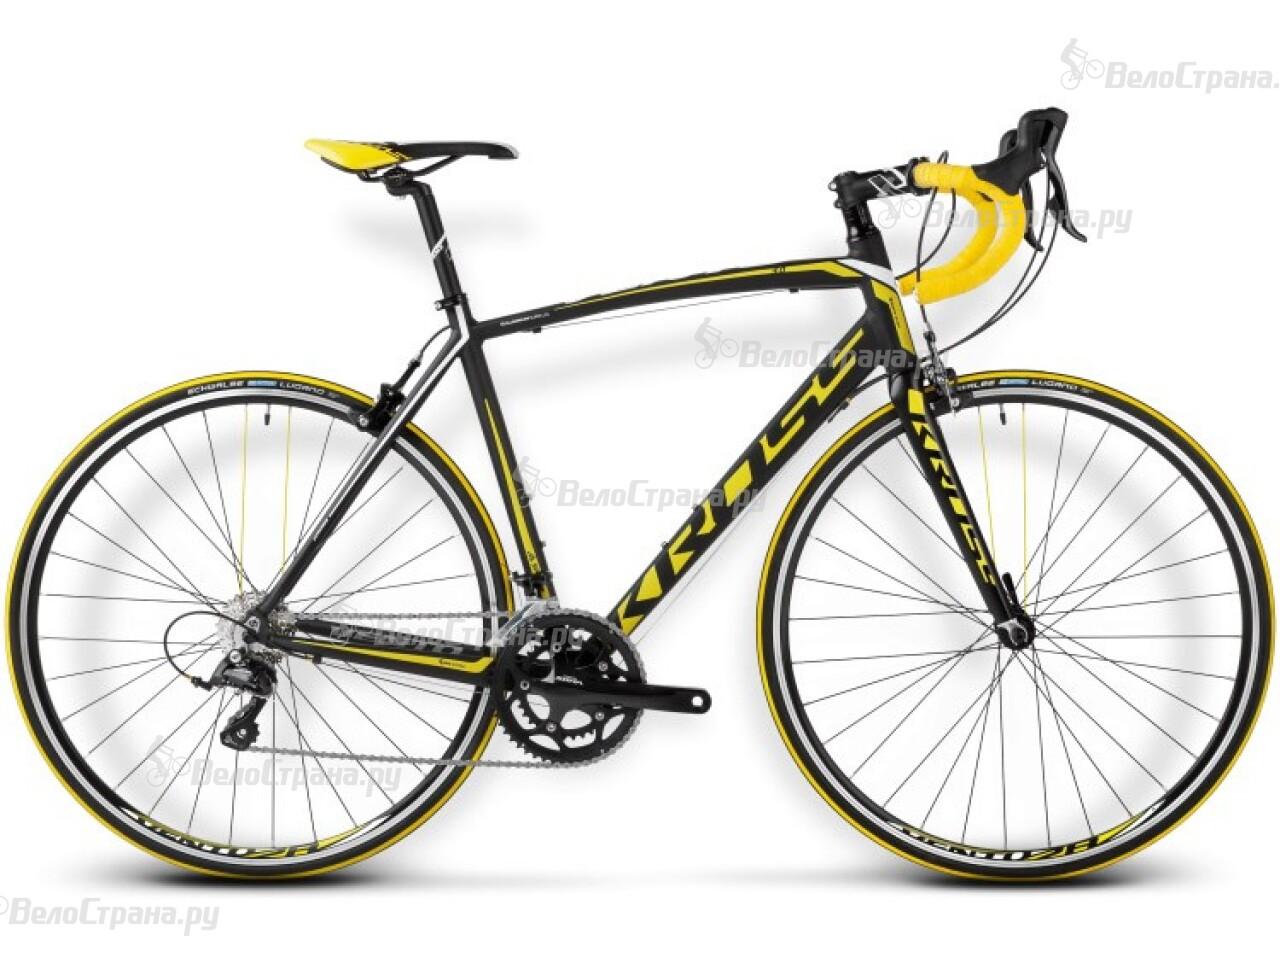 Велосипед Kross Vento 3.0 (2015) велосипед kross pulso 1 2015